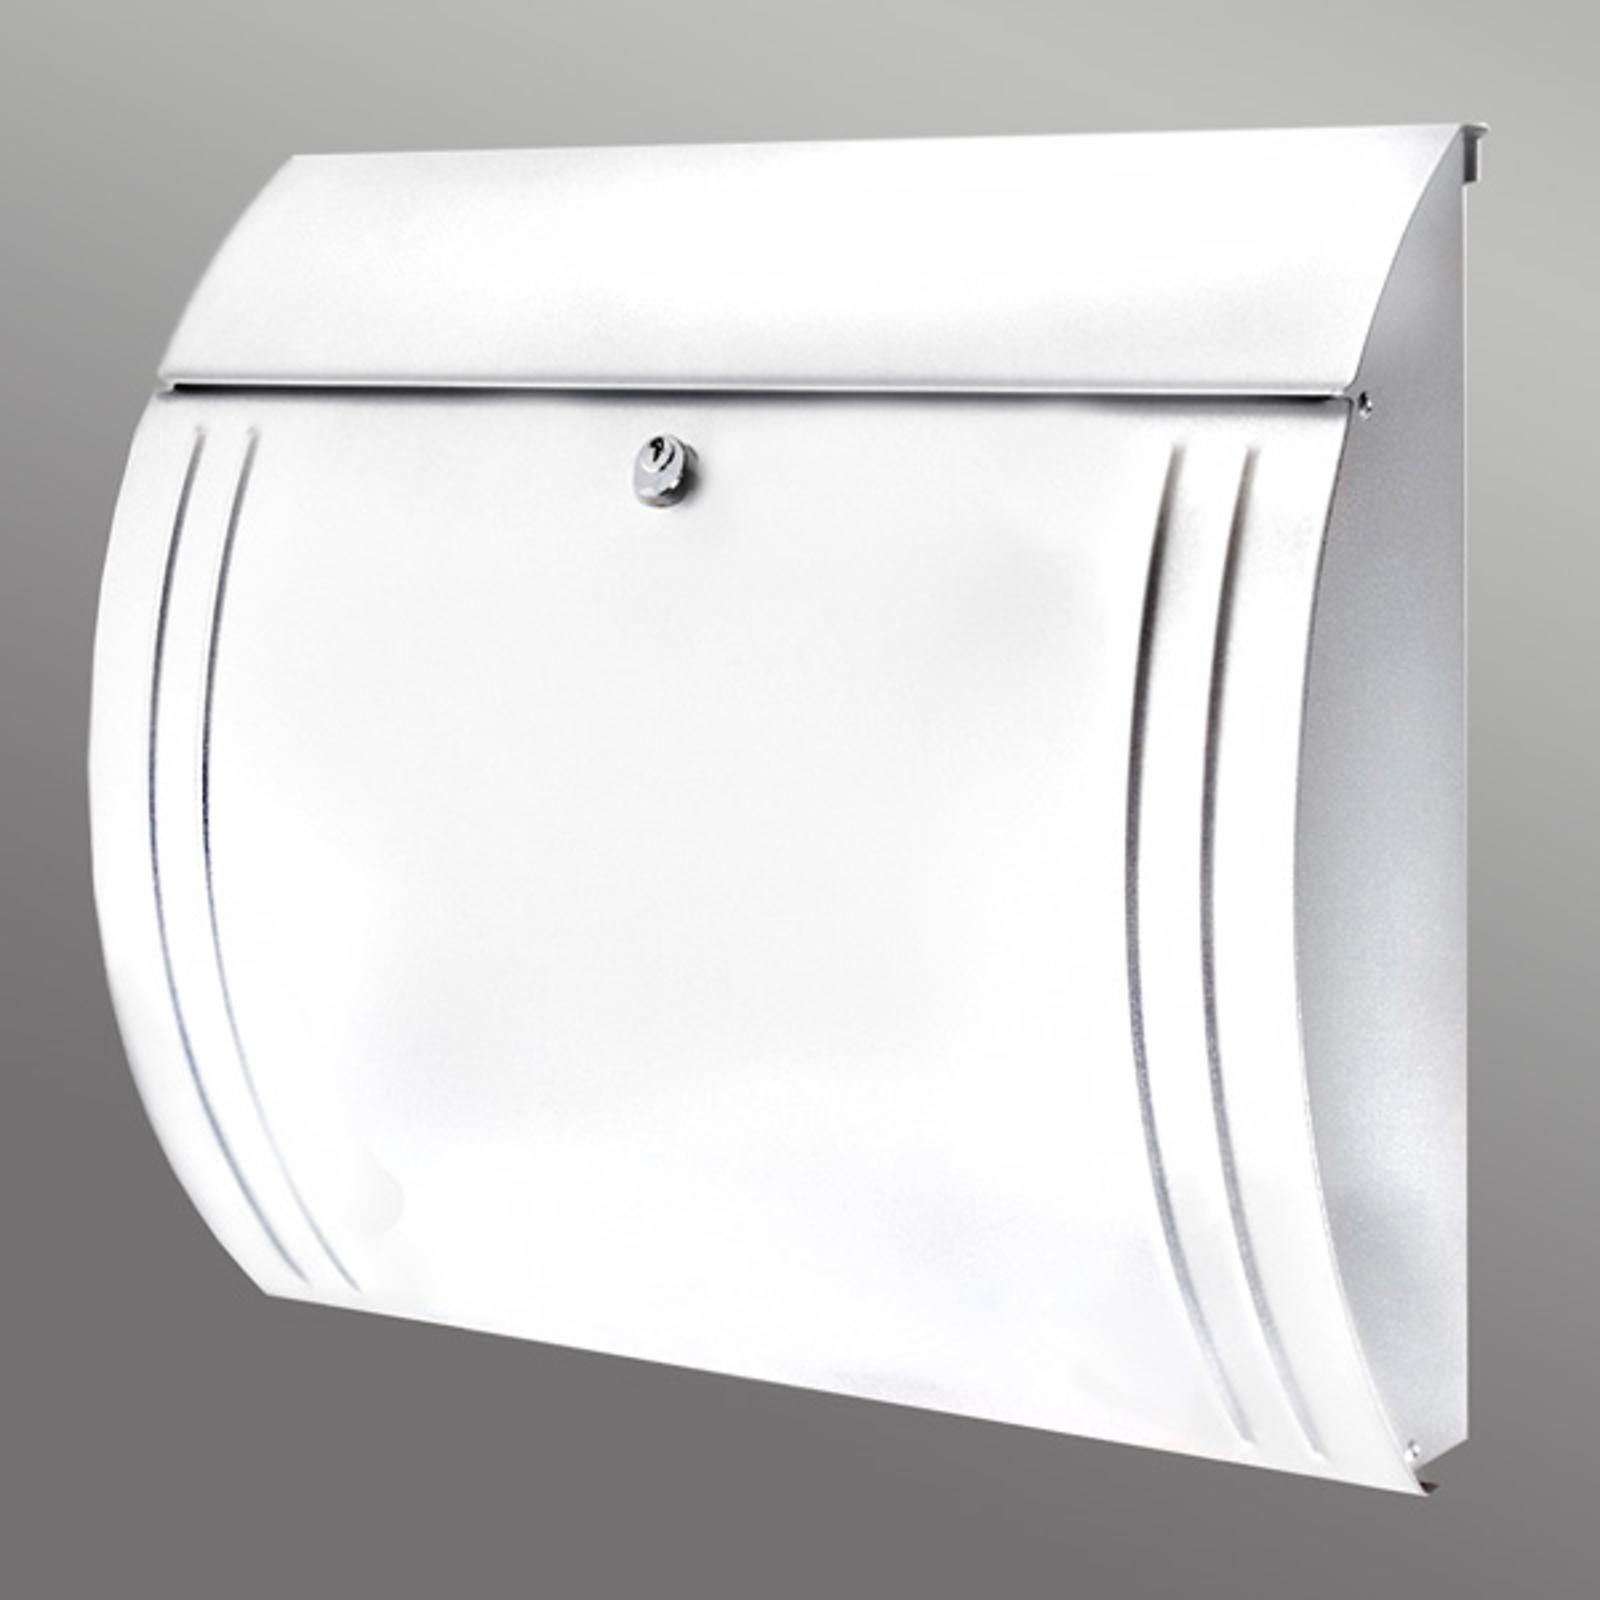 Modena stålbrevlåda i vacker form, vit